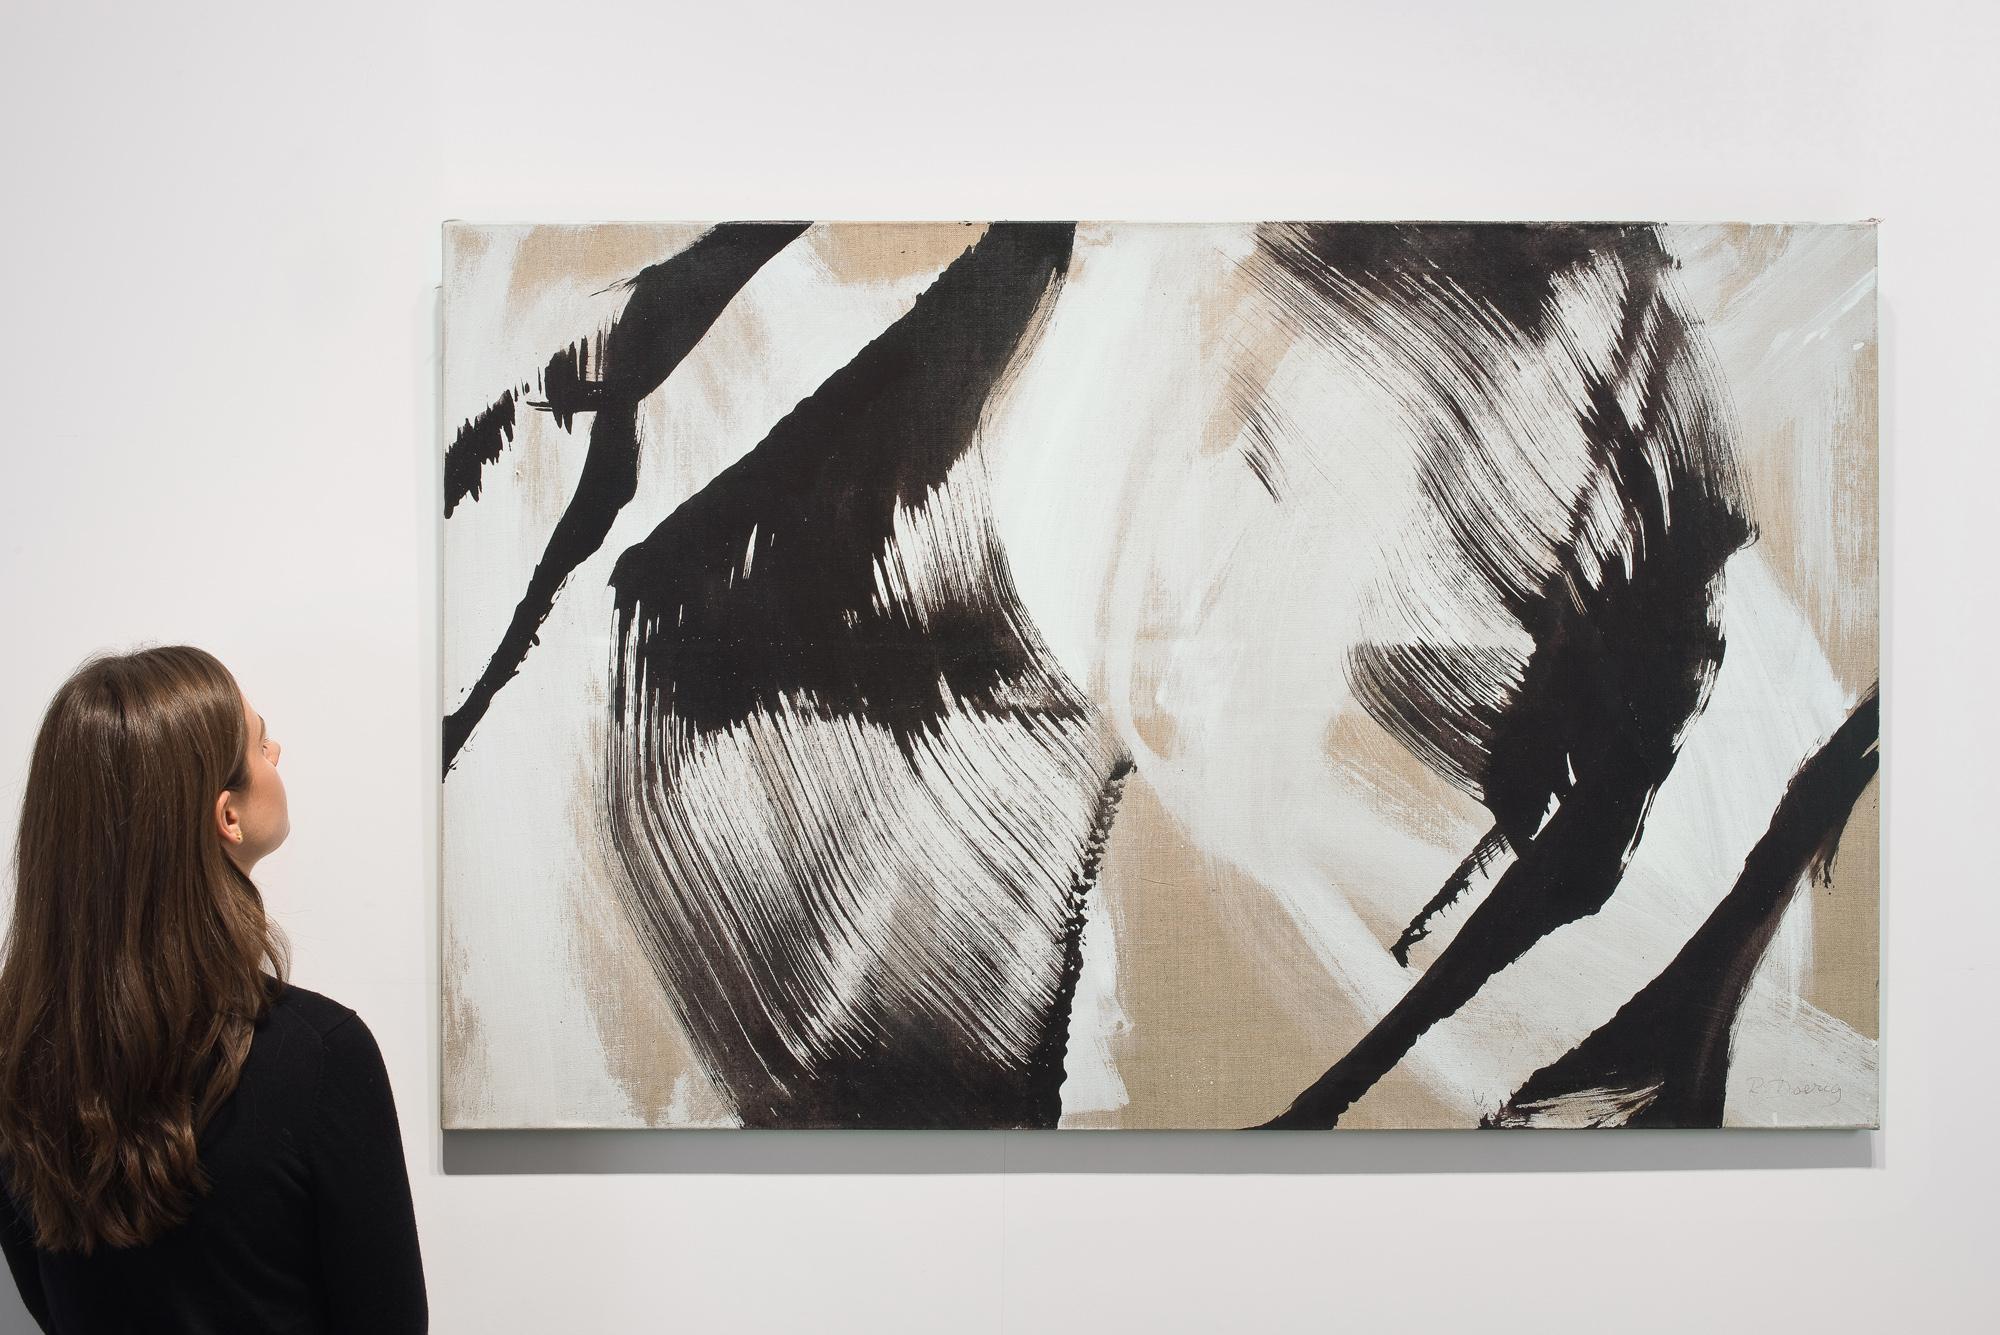 roswitha doerig - gestes blancs noirs peinture 2008